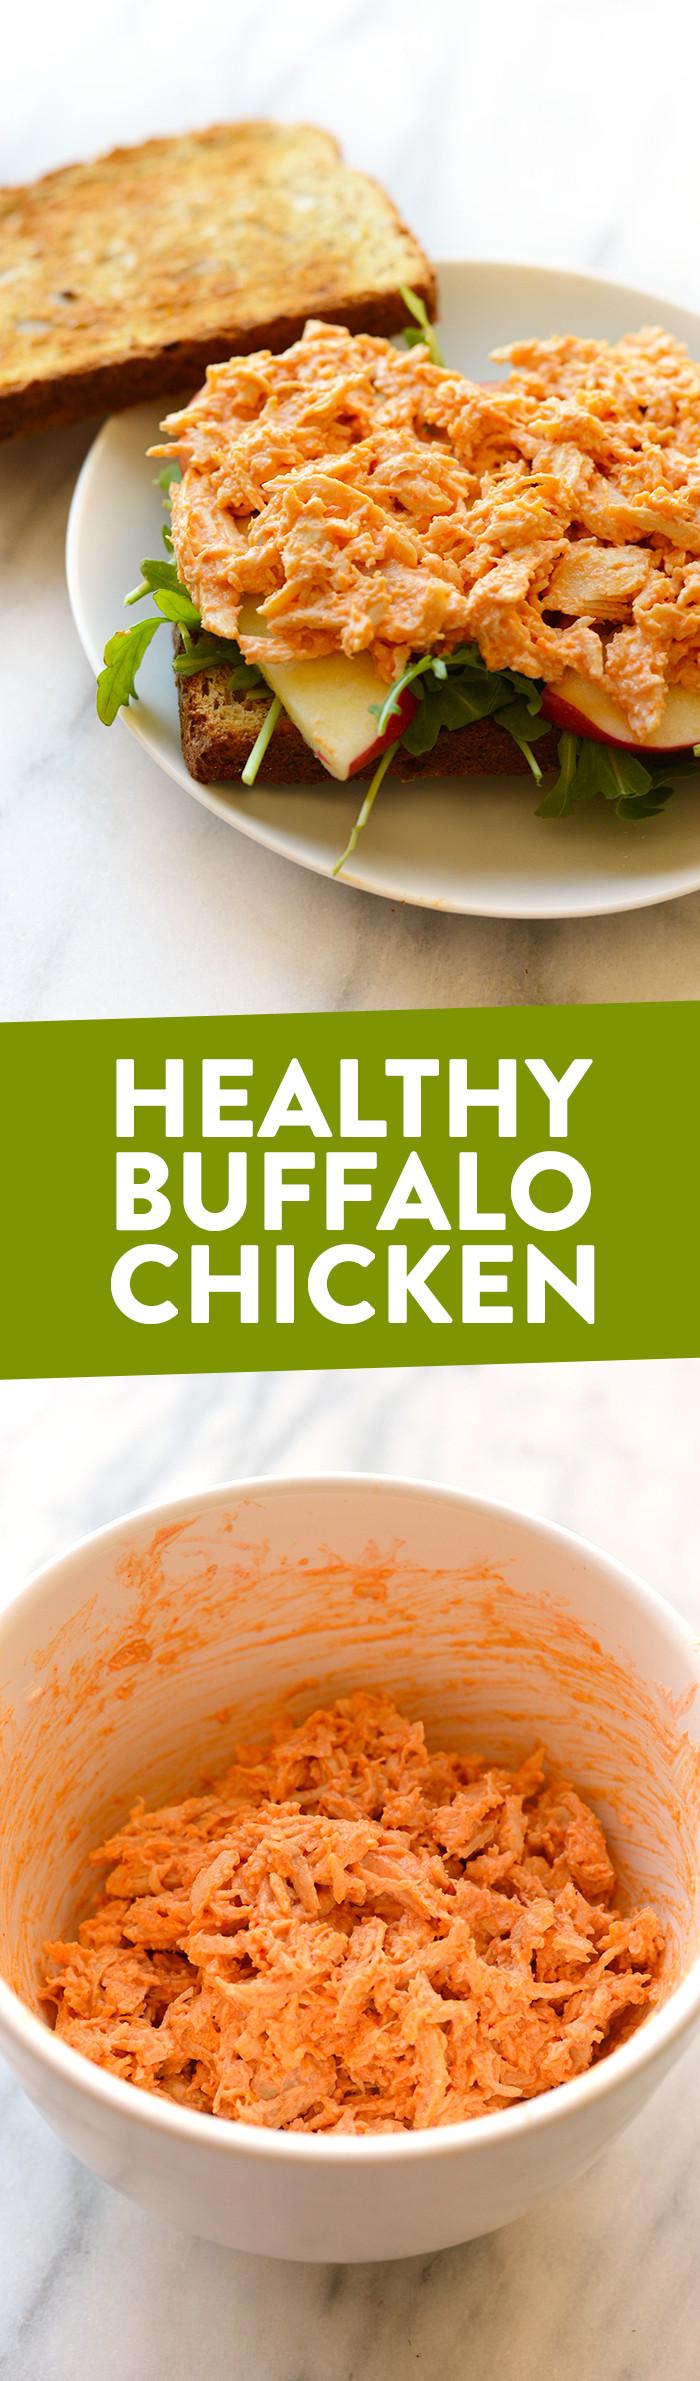 Buffalo Chicken Recipes Healthy  Healthy Buffalo Chicken Recipe Video Fit Foo Finds